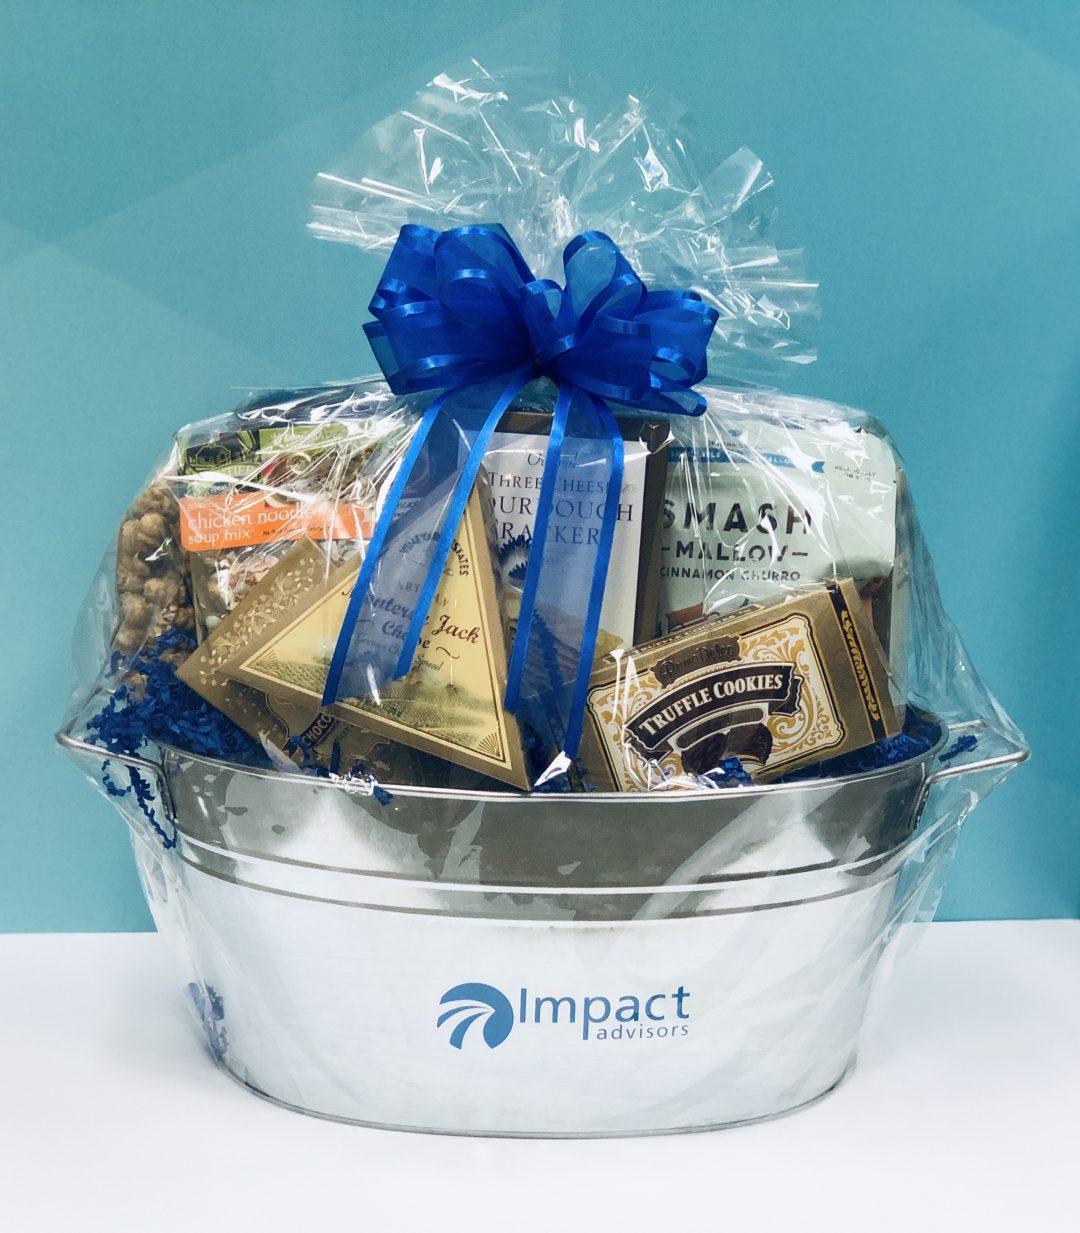 Impact Advisors Gift Basket